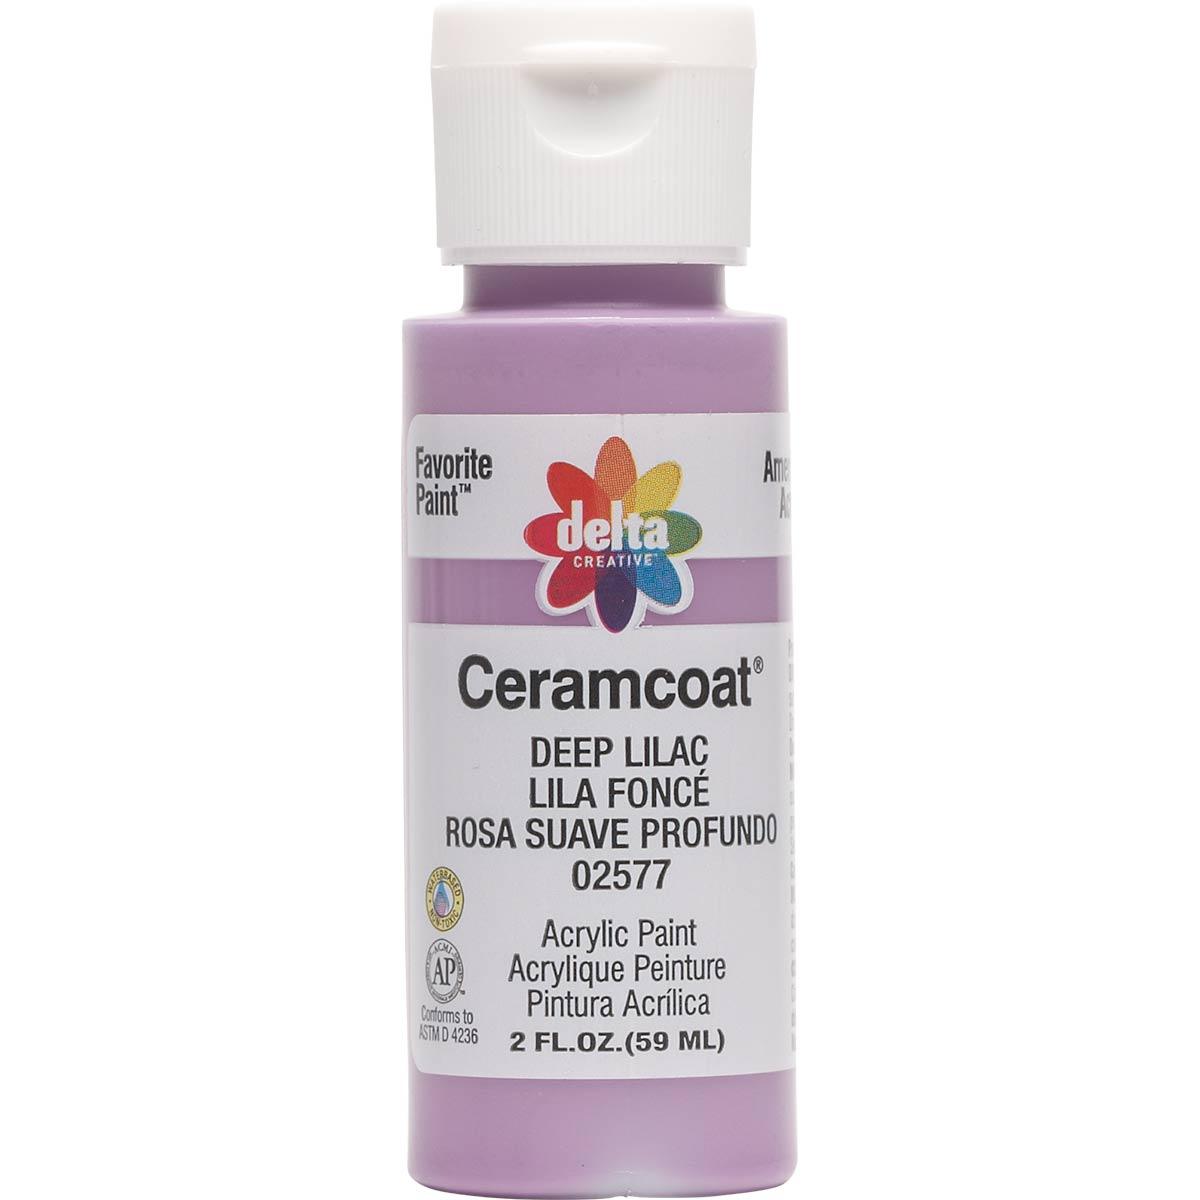 Delta Ceramcoat ® Acrylic Paint - Deep Lilac, 2 oz.